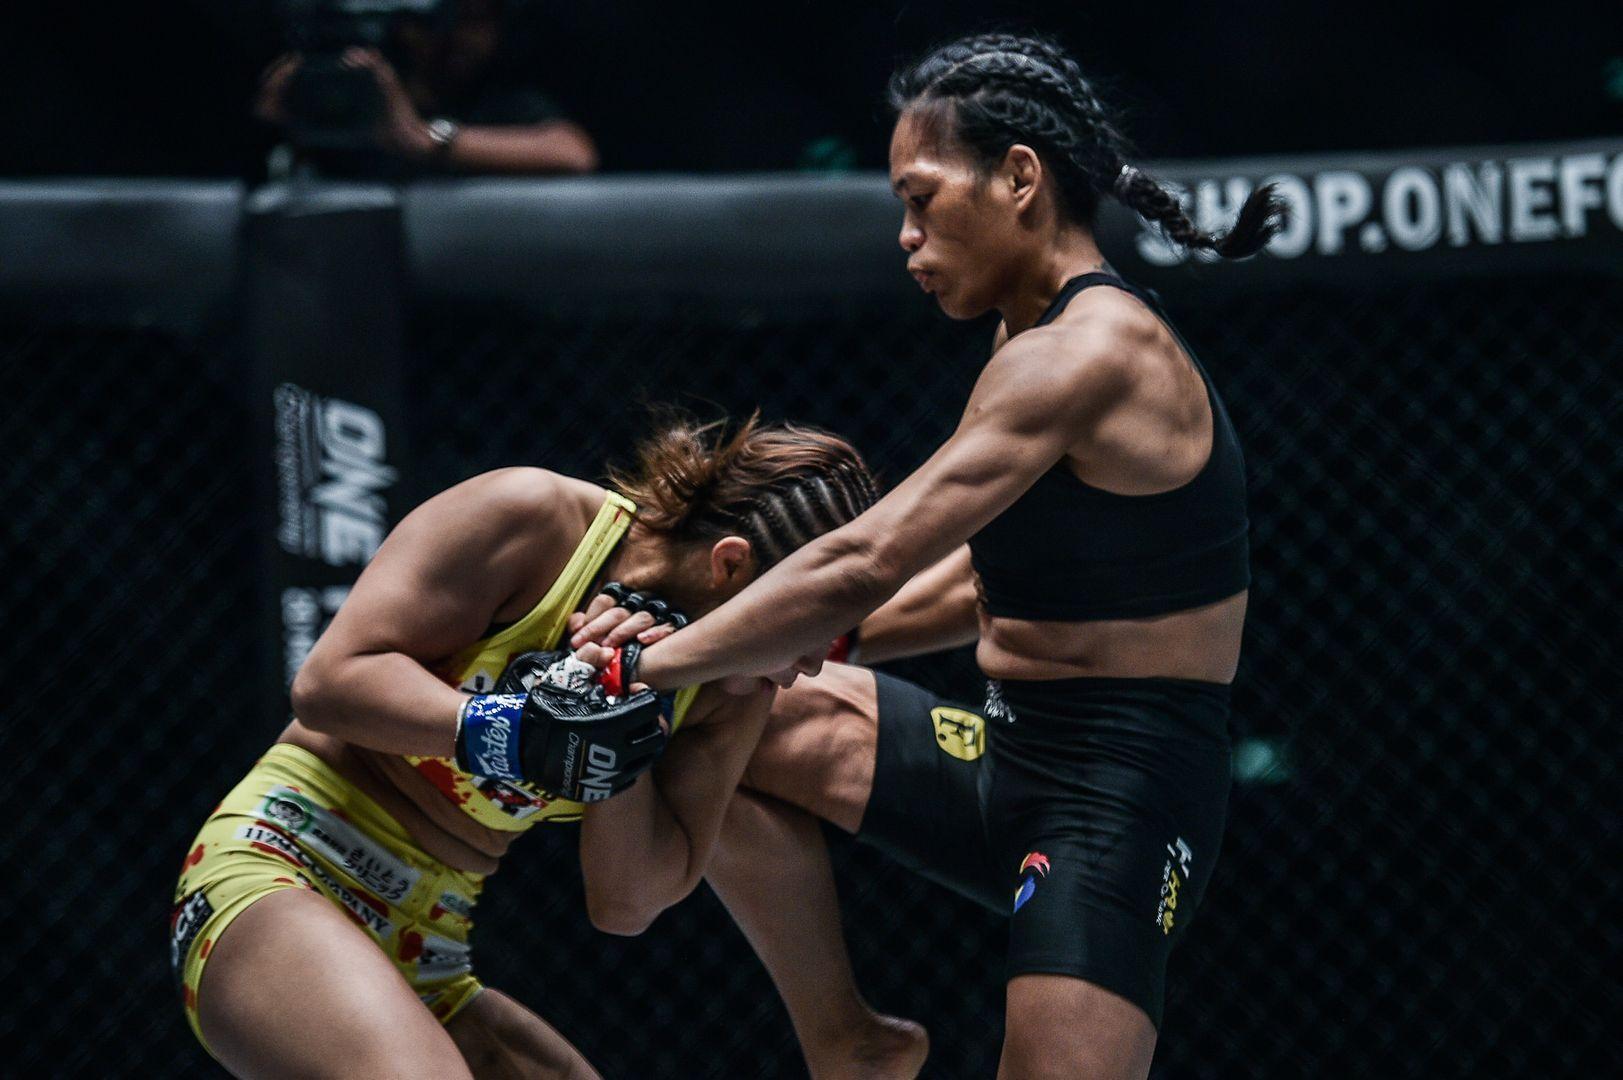 Tiffany Teo knees Ayaka Miura at ONE KING OF THE JUNGLE